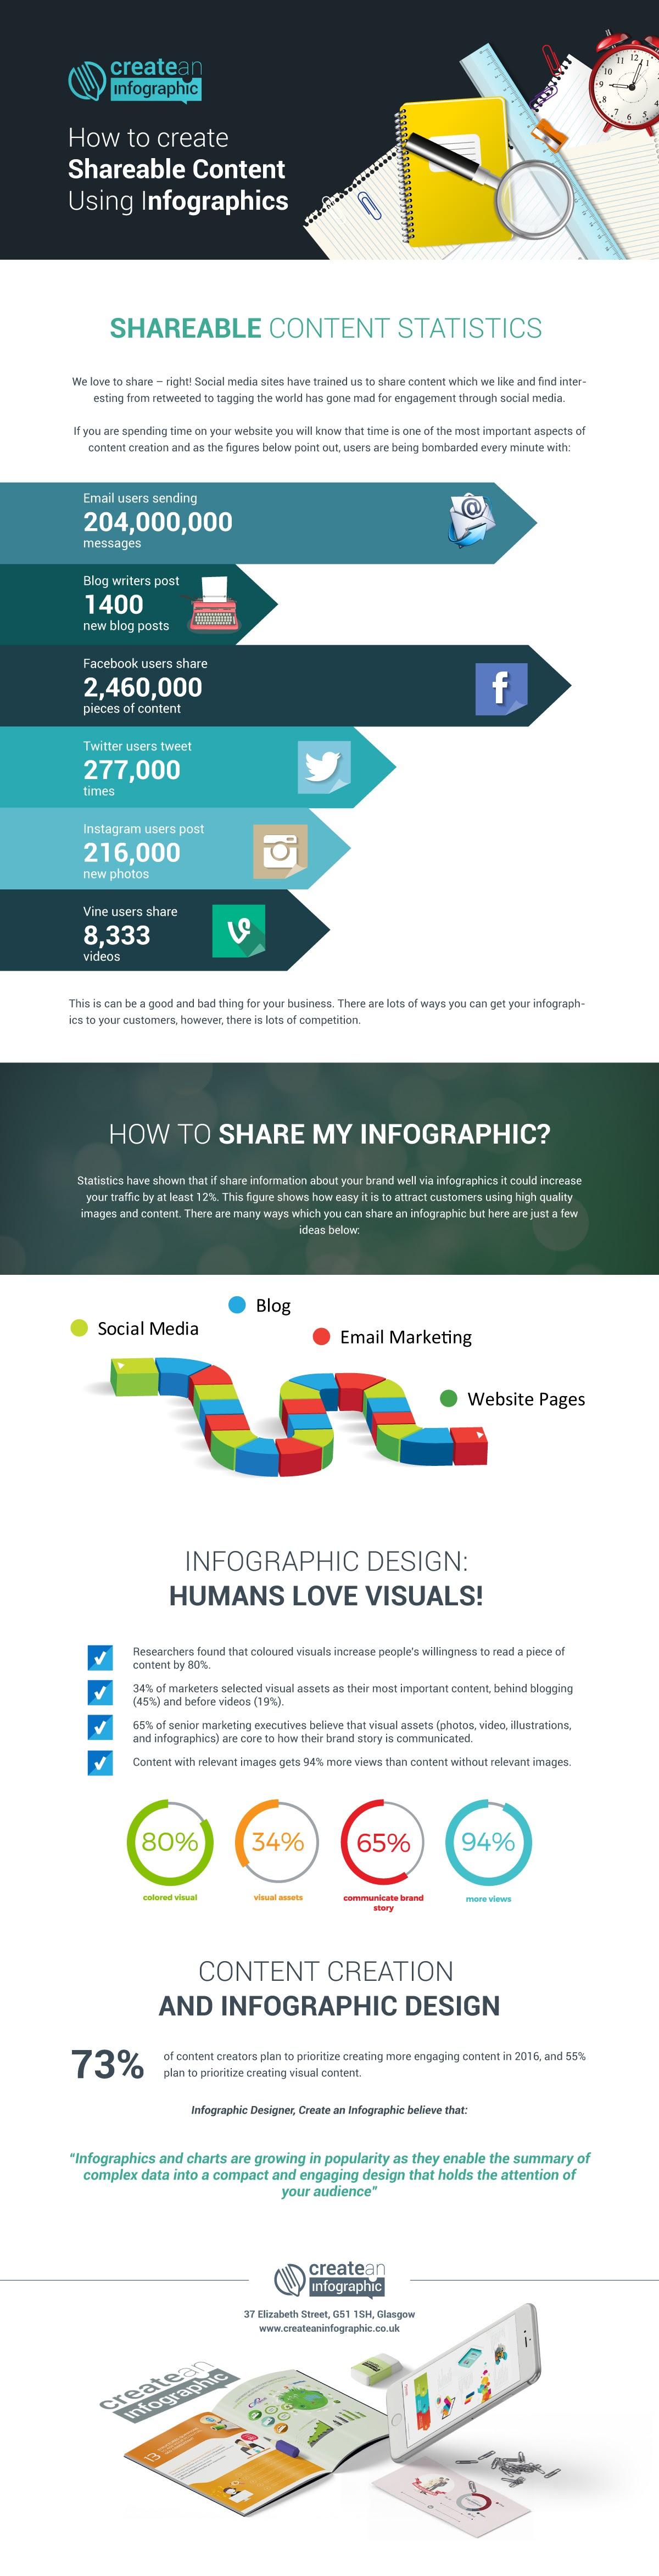 Las infografías como medio para compartir contenido con altas probabilidades de ser compartido